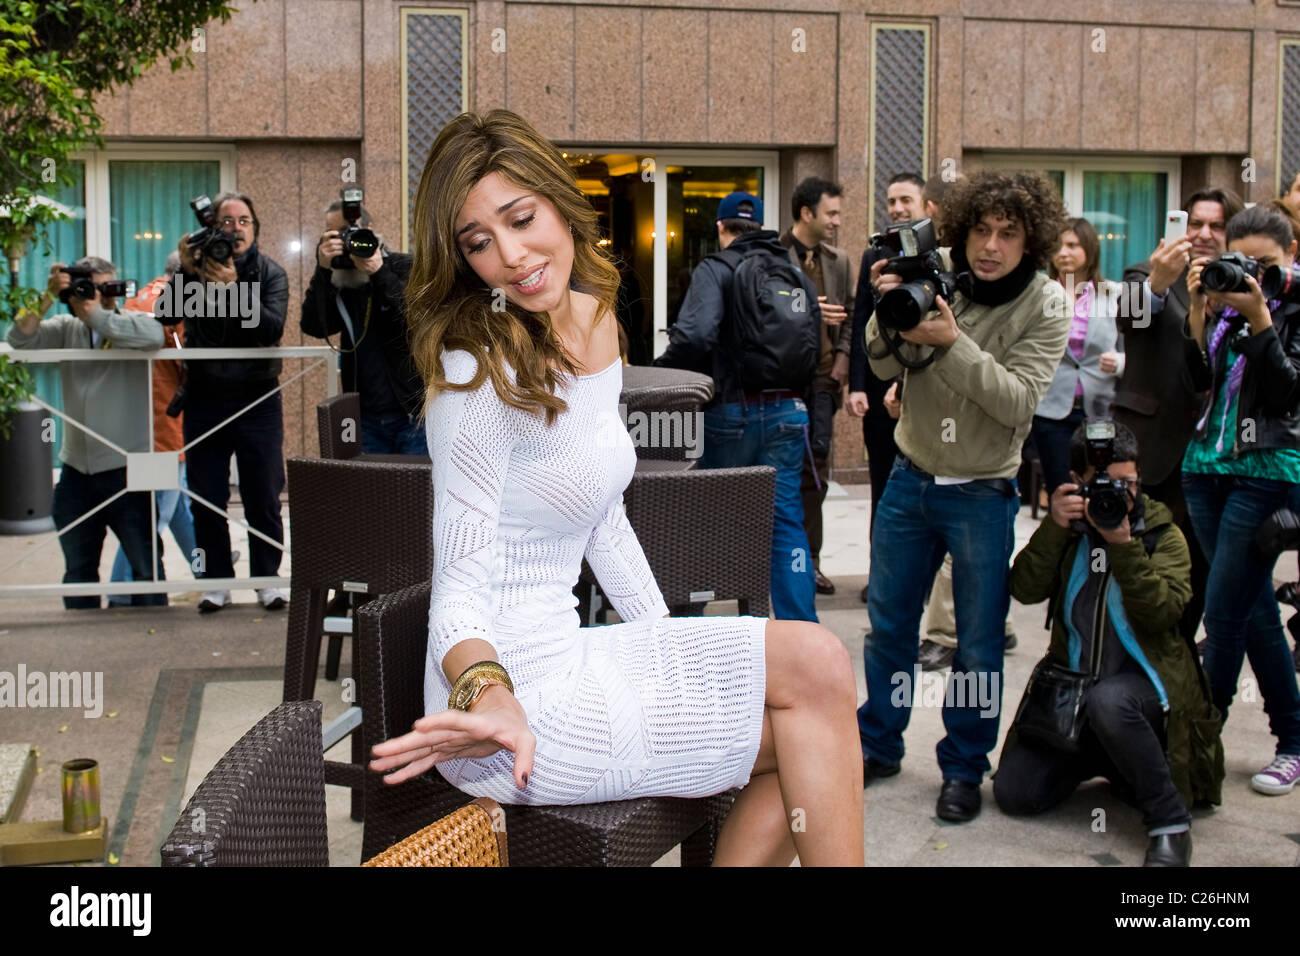 "04.04.2011, Milano. Photocall ""Ciak si gira...'. Belen Rodriguez Immagini Stock"